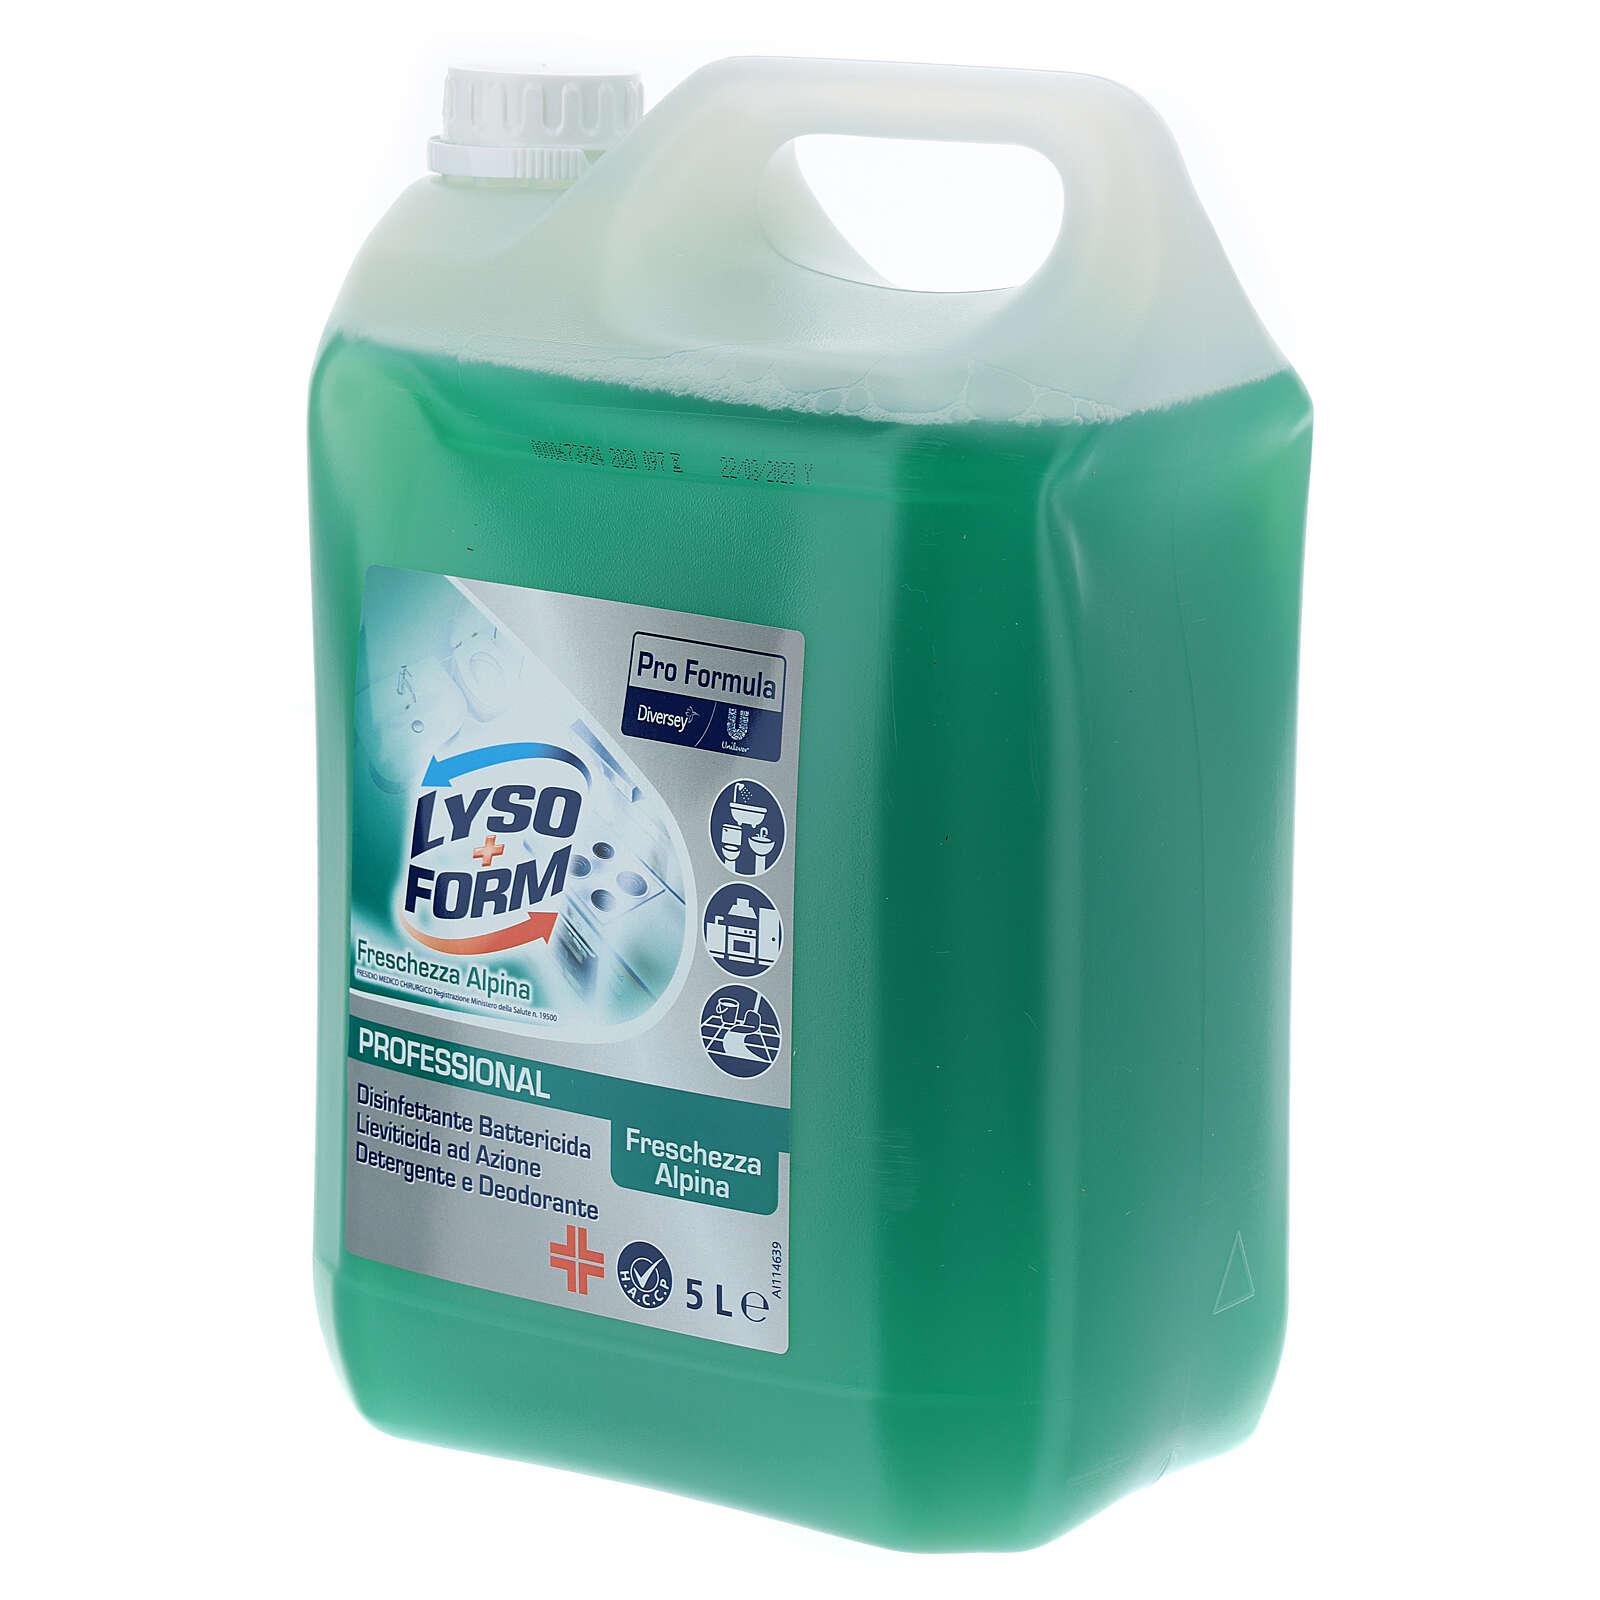 Galãodetergente Pro Formula Lysoform 5 litros 3